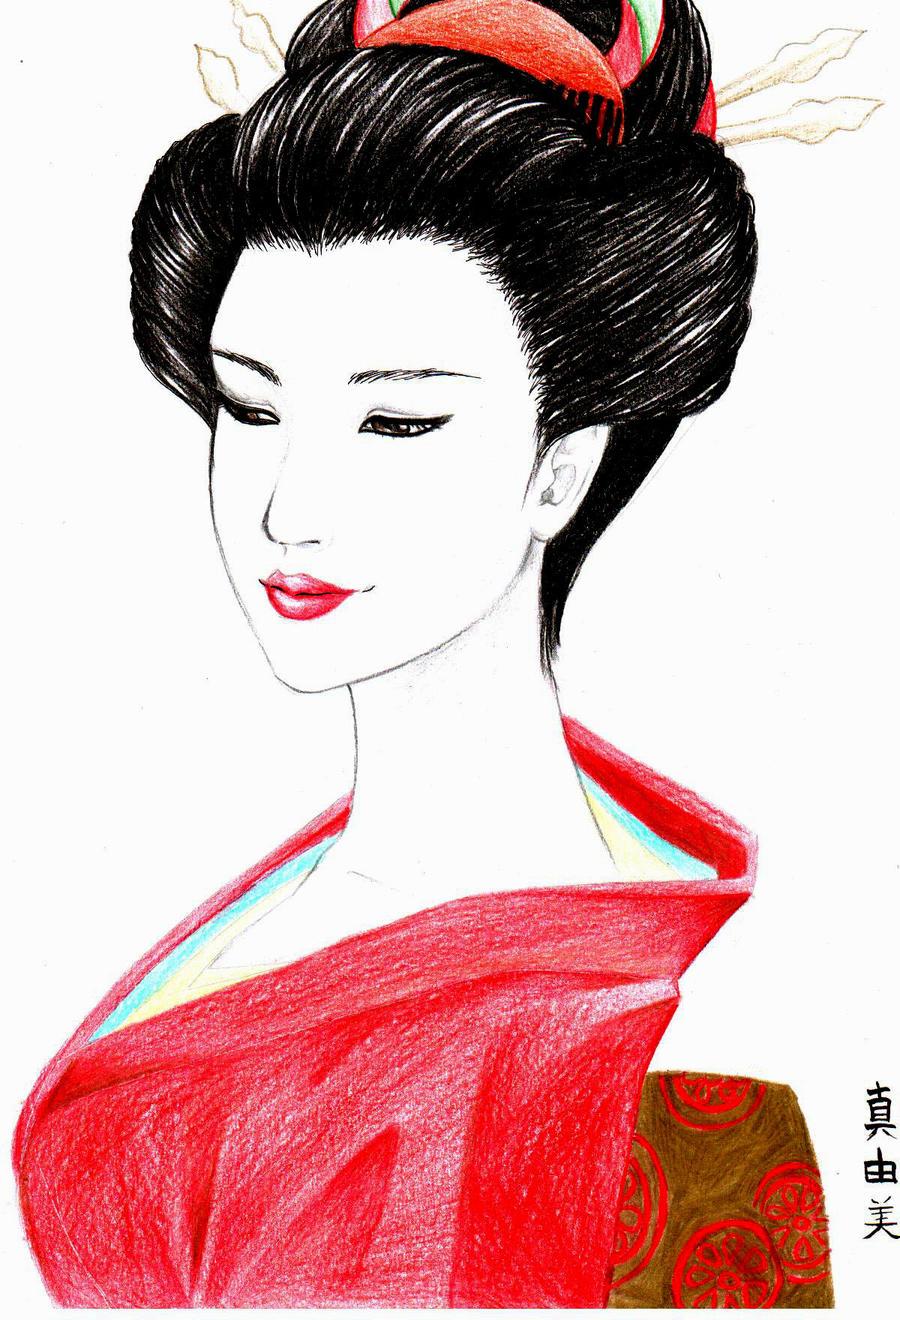 Galeria de desenhos Mayumi (Chibi May) - Página 10 Gueixa_by_ChibiMay